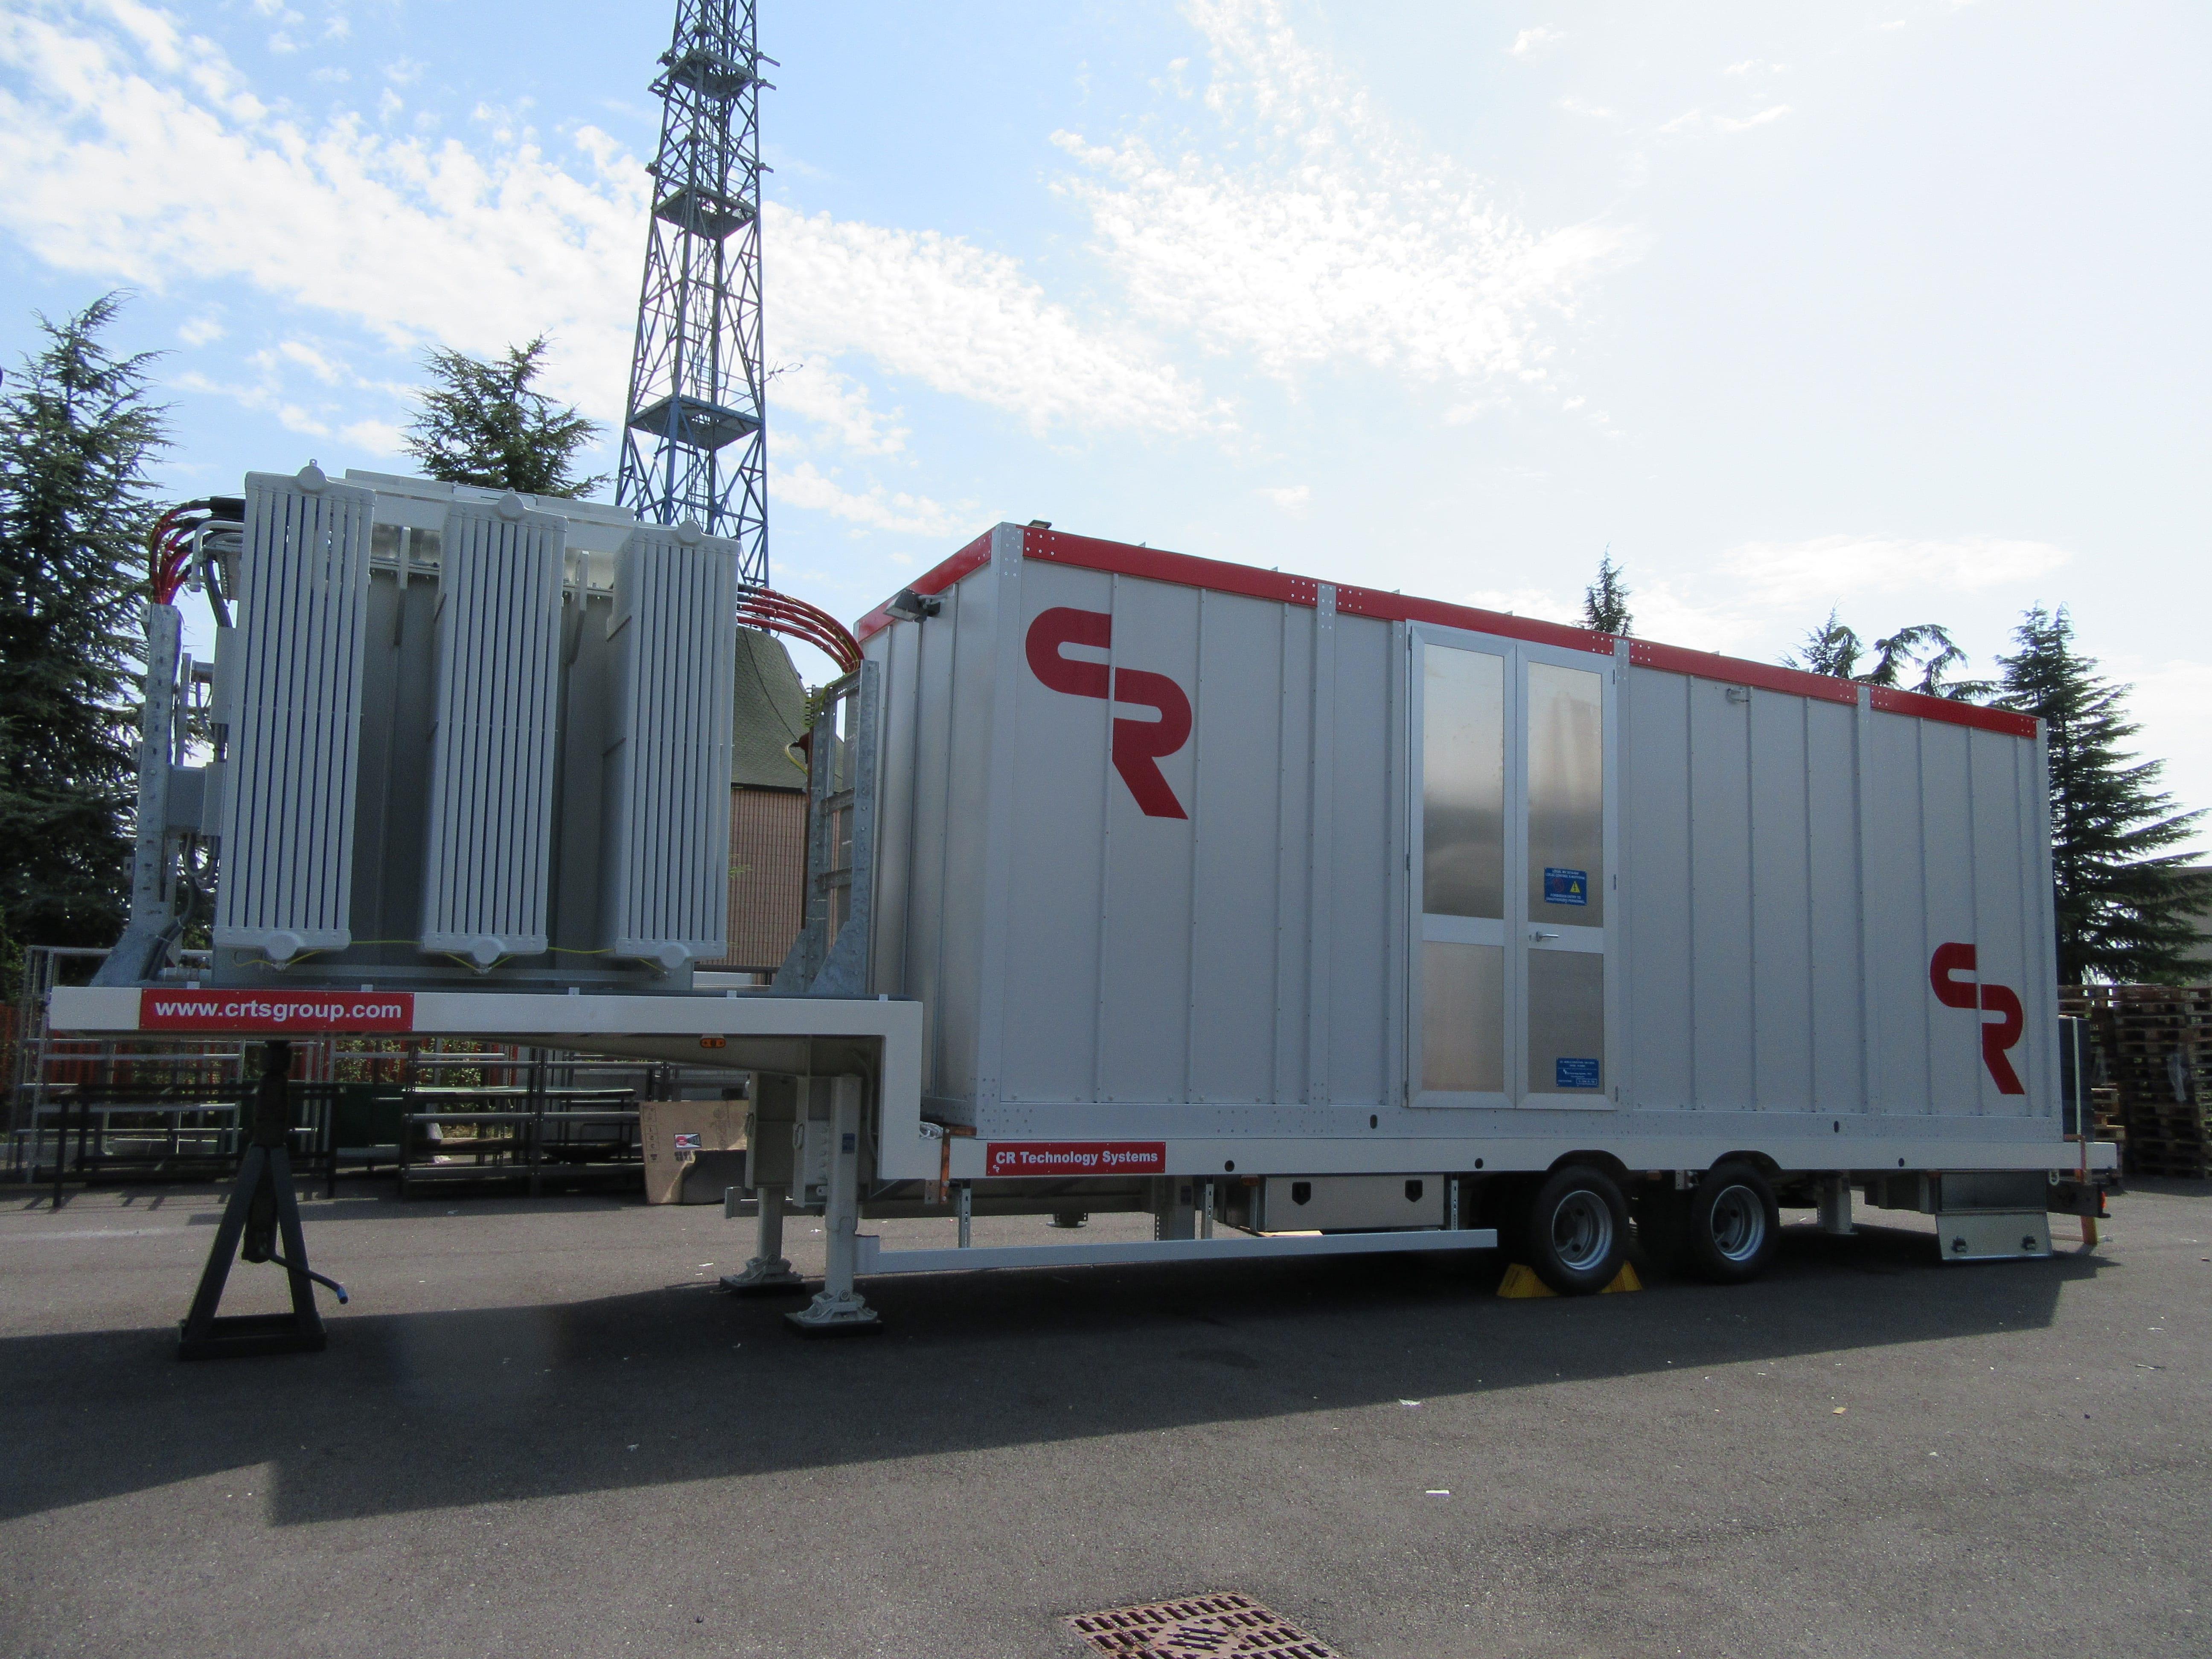 Mobile substation for Albania, Europe